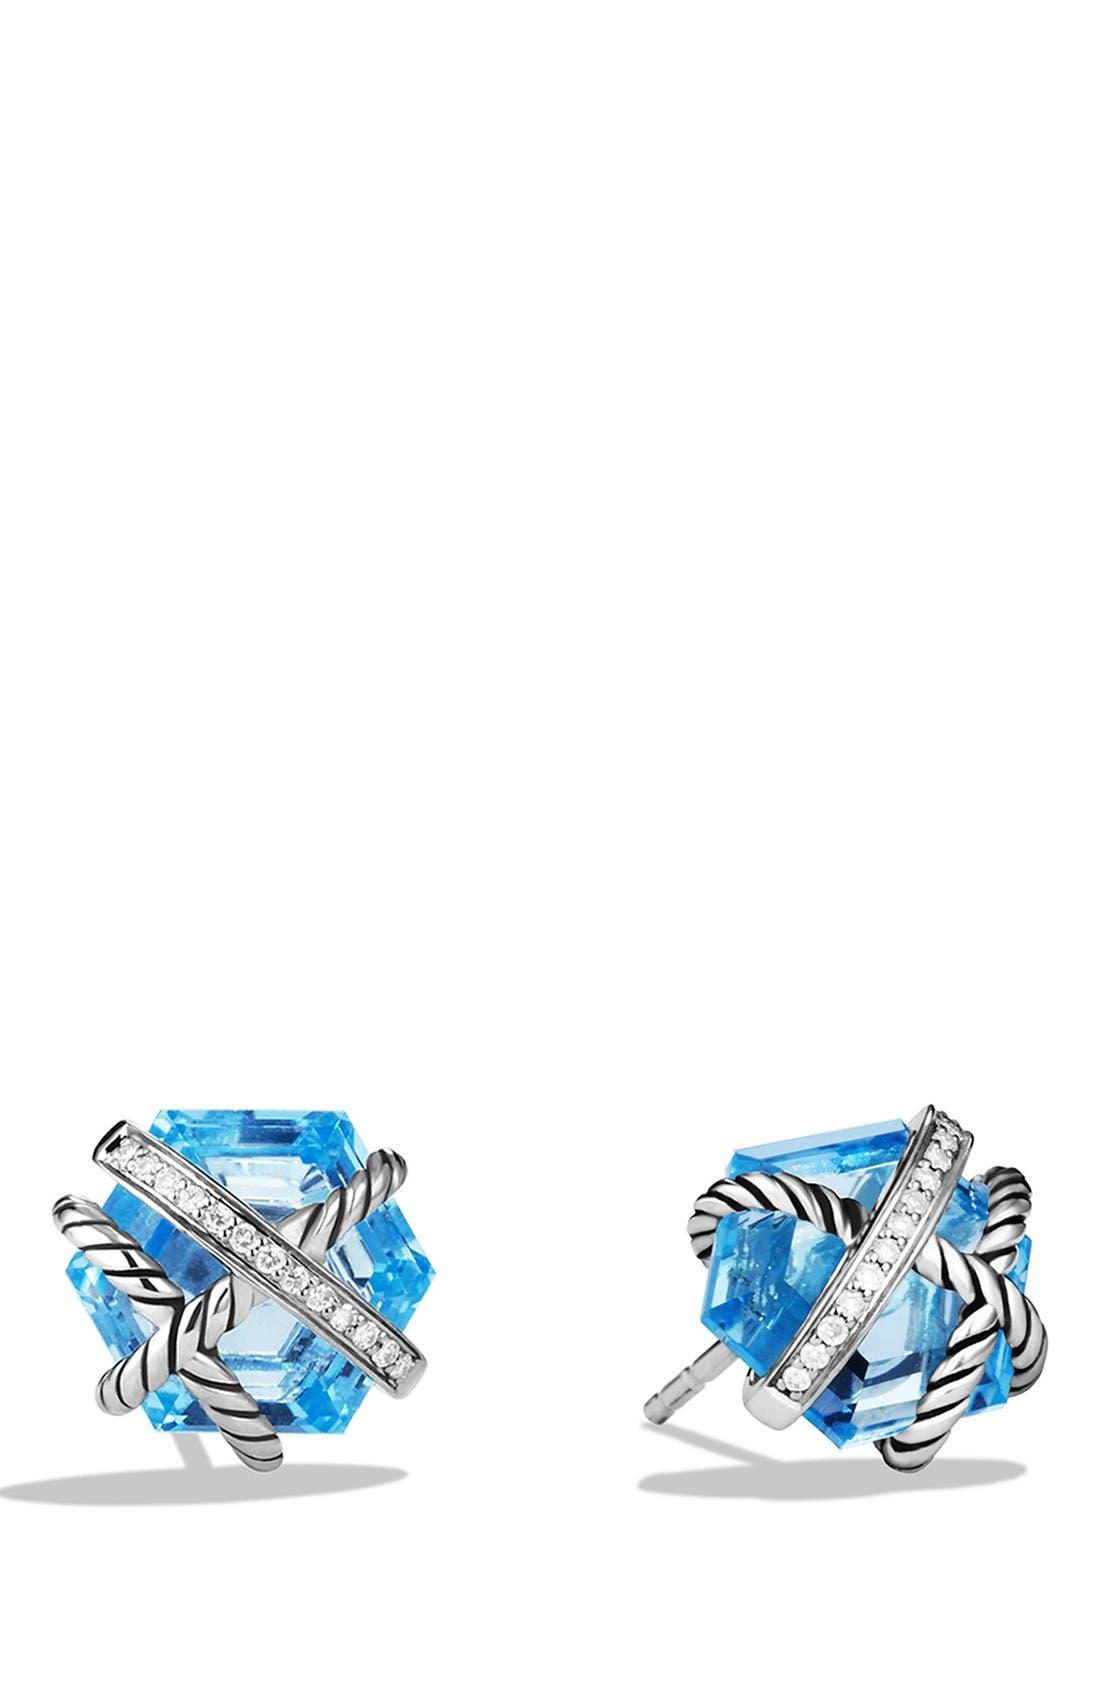 David Yurman 'Cable Wrap' Earrings with Semiprecious Stones & Diamonds